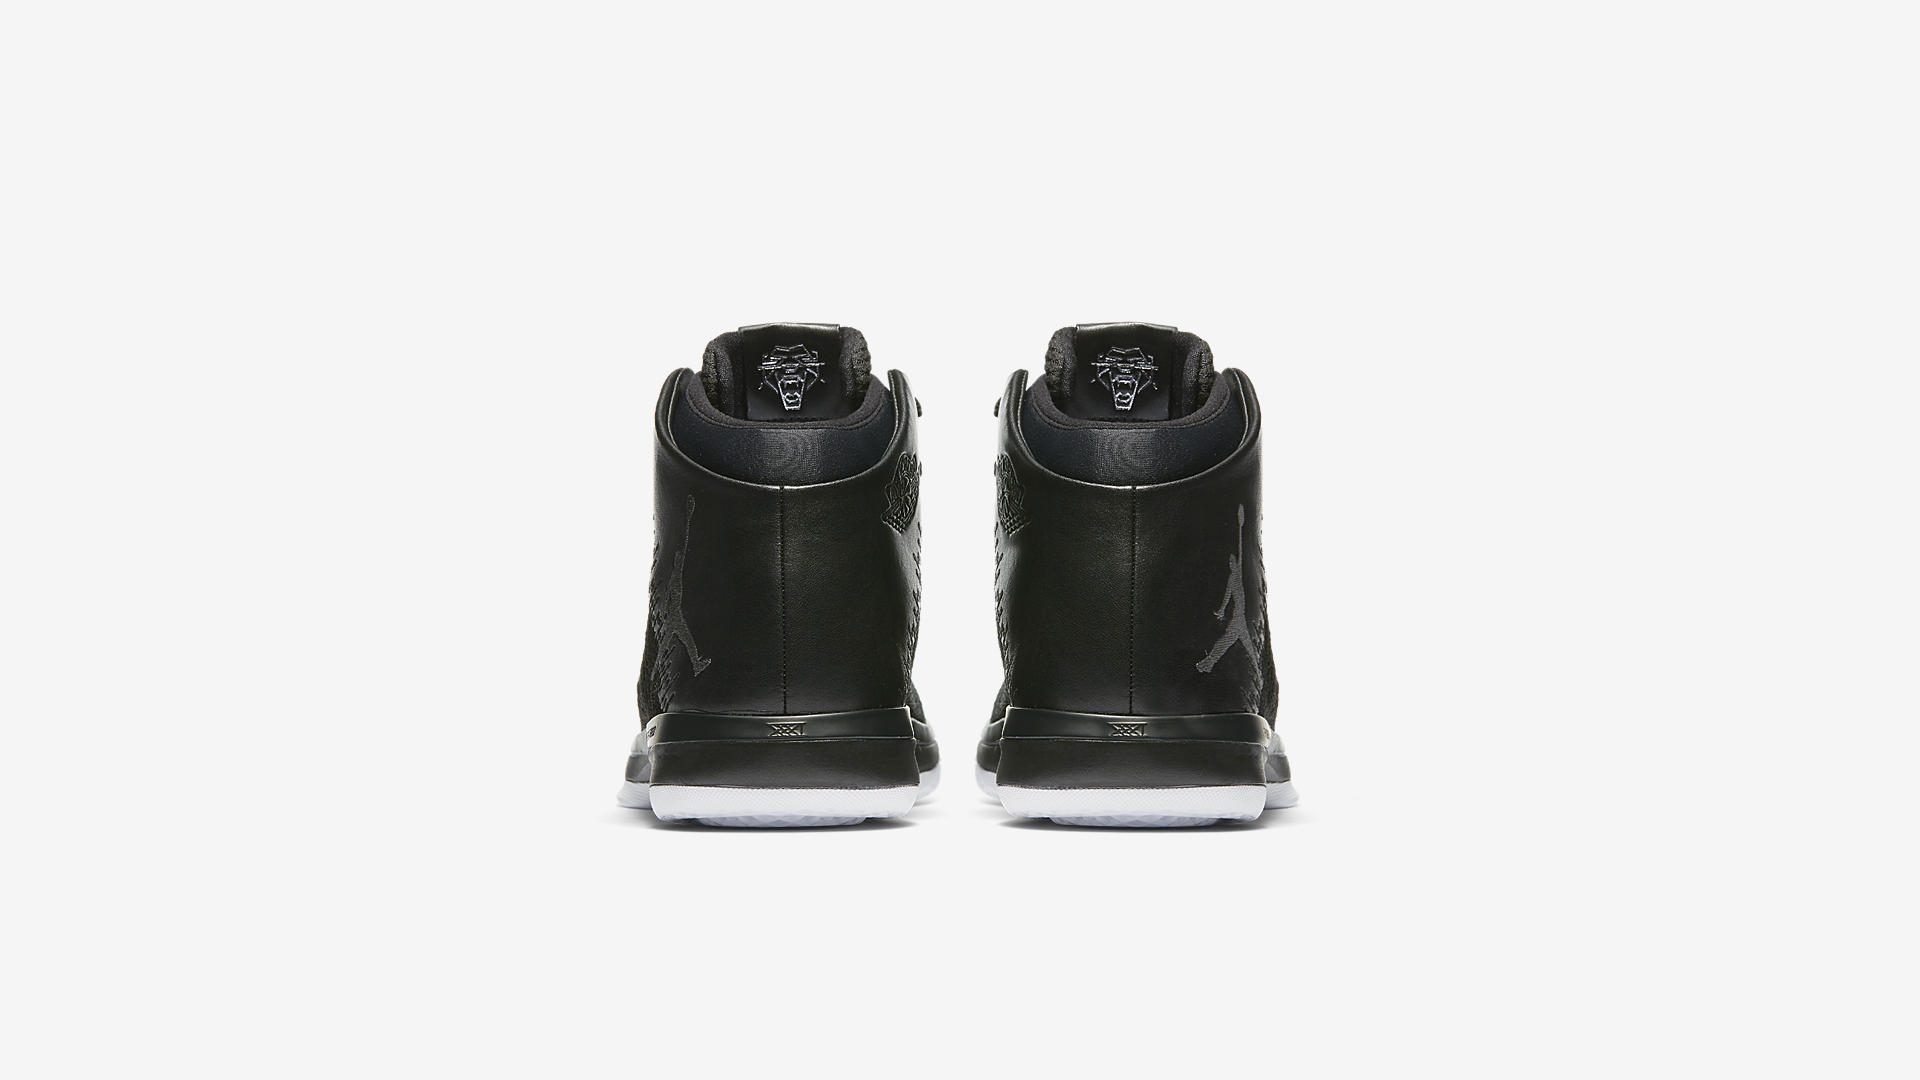 Air Jordan 31 Black Cat 845037 010 2